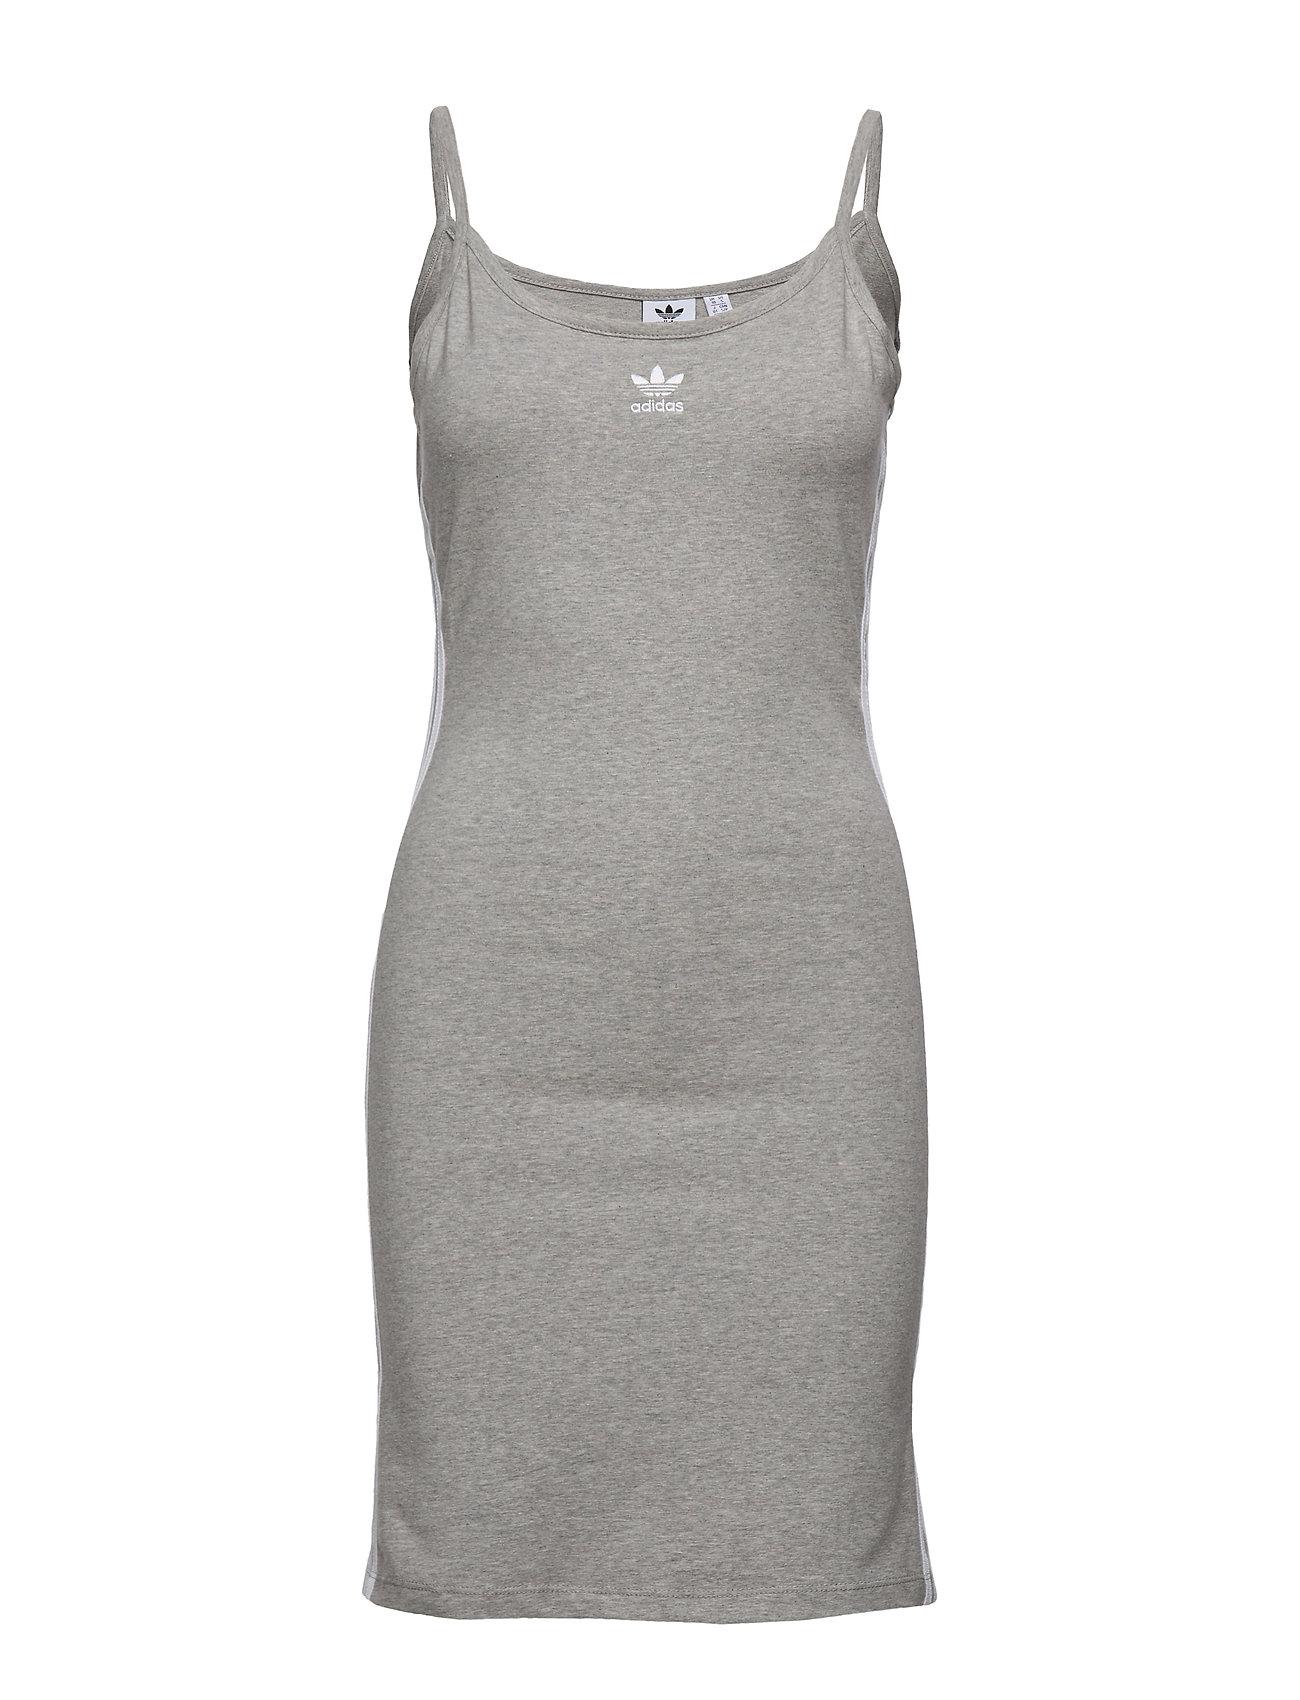 adidas Originals TANK DRESS - MGREYH/WHITE